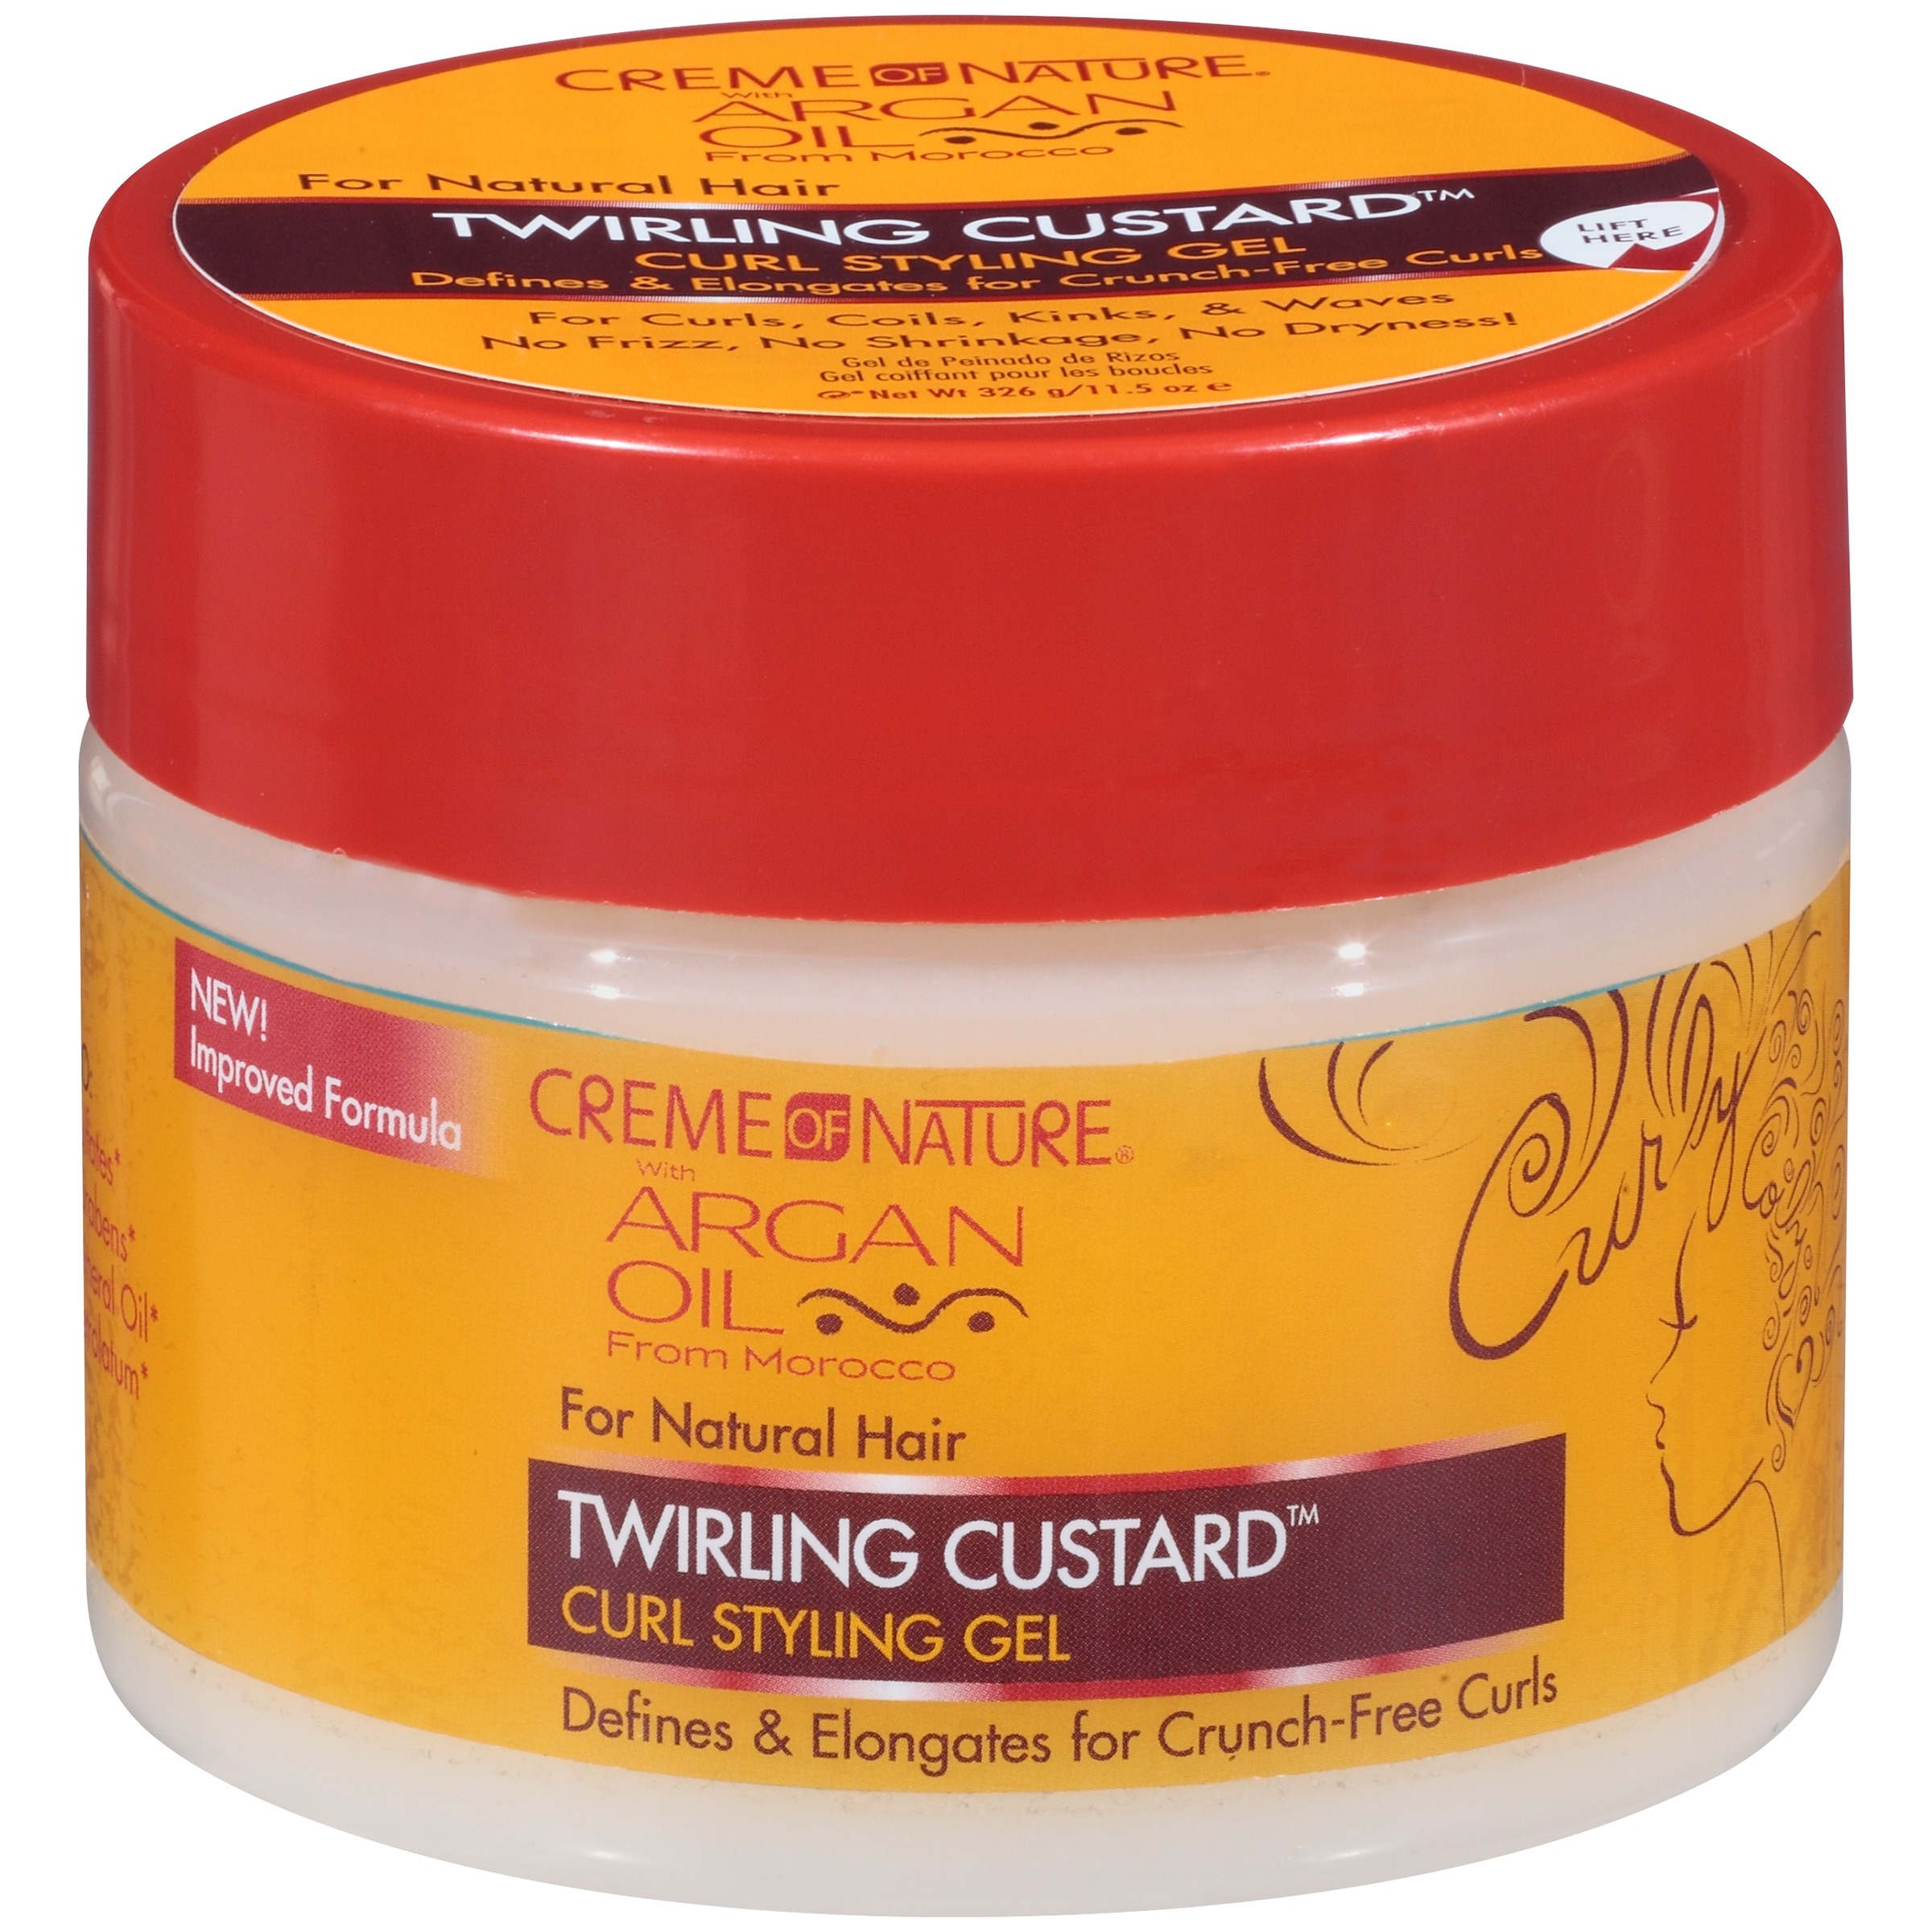 Creme of Nature Twirling Custard Curl Styling Gel, 11.5 oz